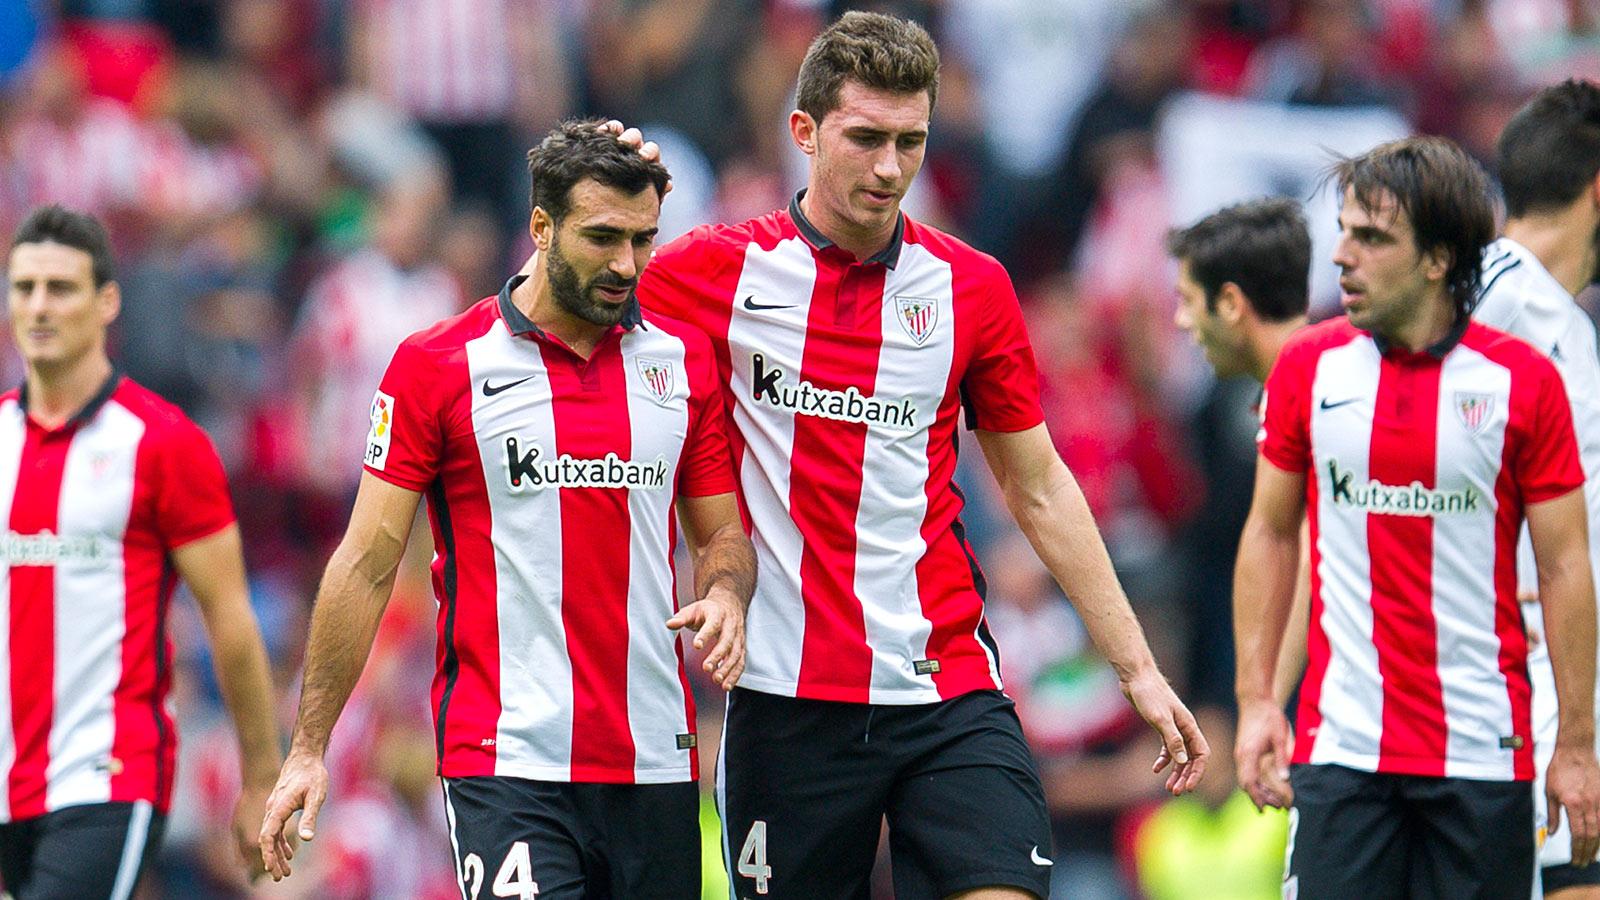 Athletic Bilbao clinch comeback win at home against Valencia